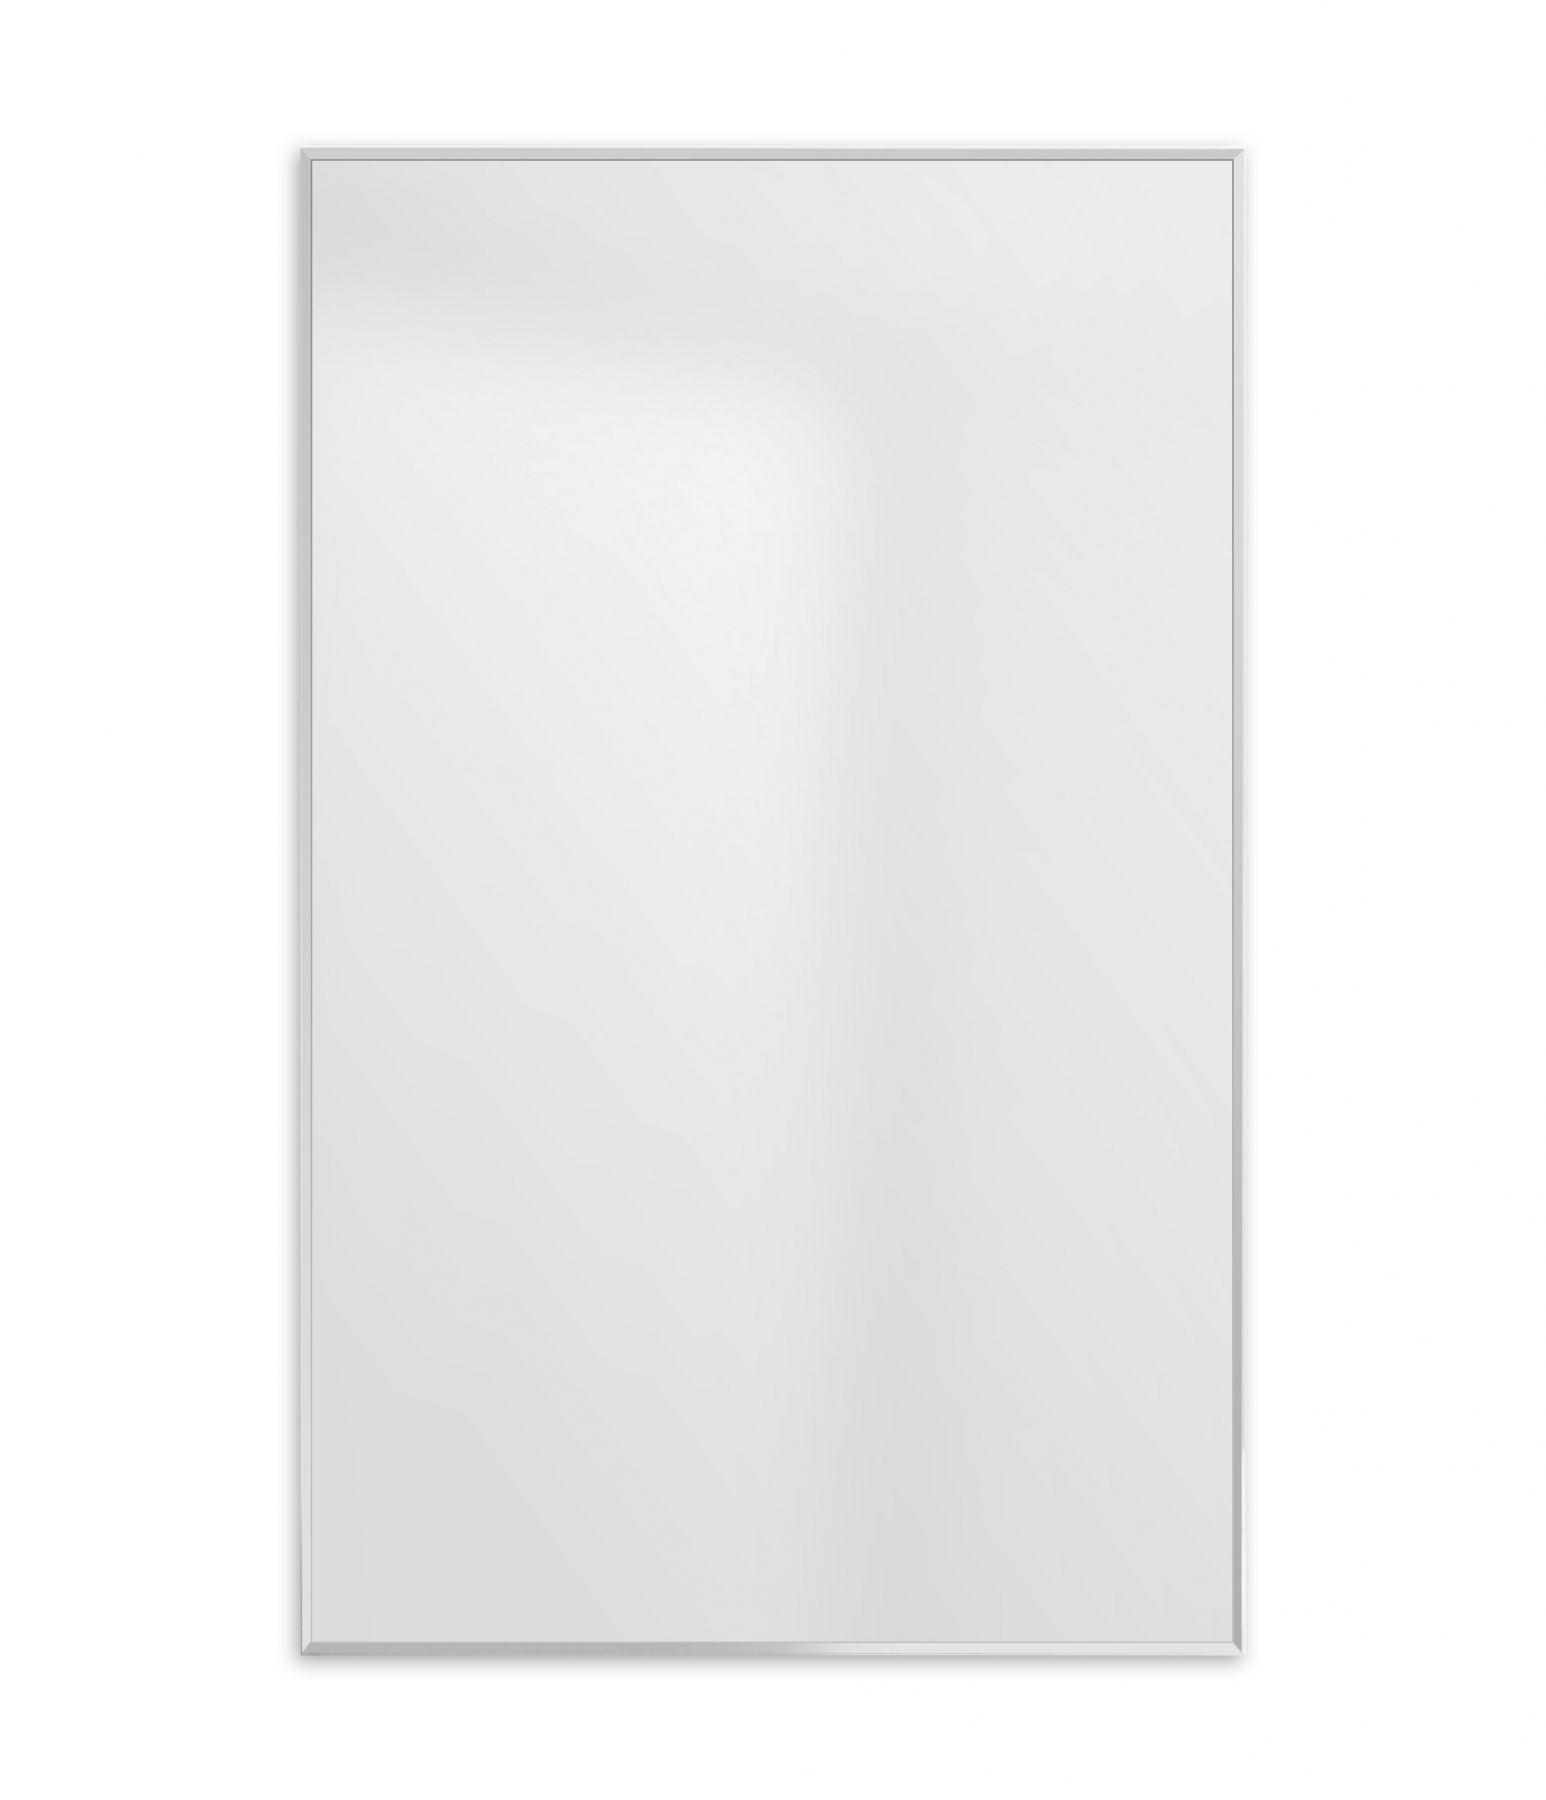 Зеркало для ванной комнаты BelBagno SPC-AL-500-800 ФОТО